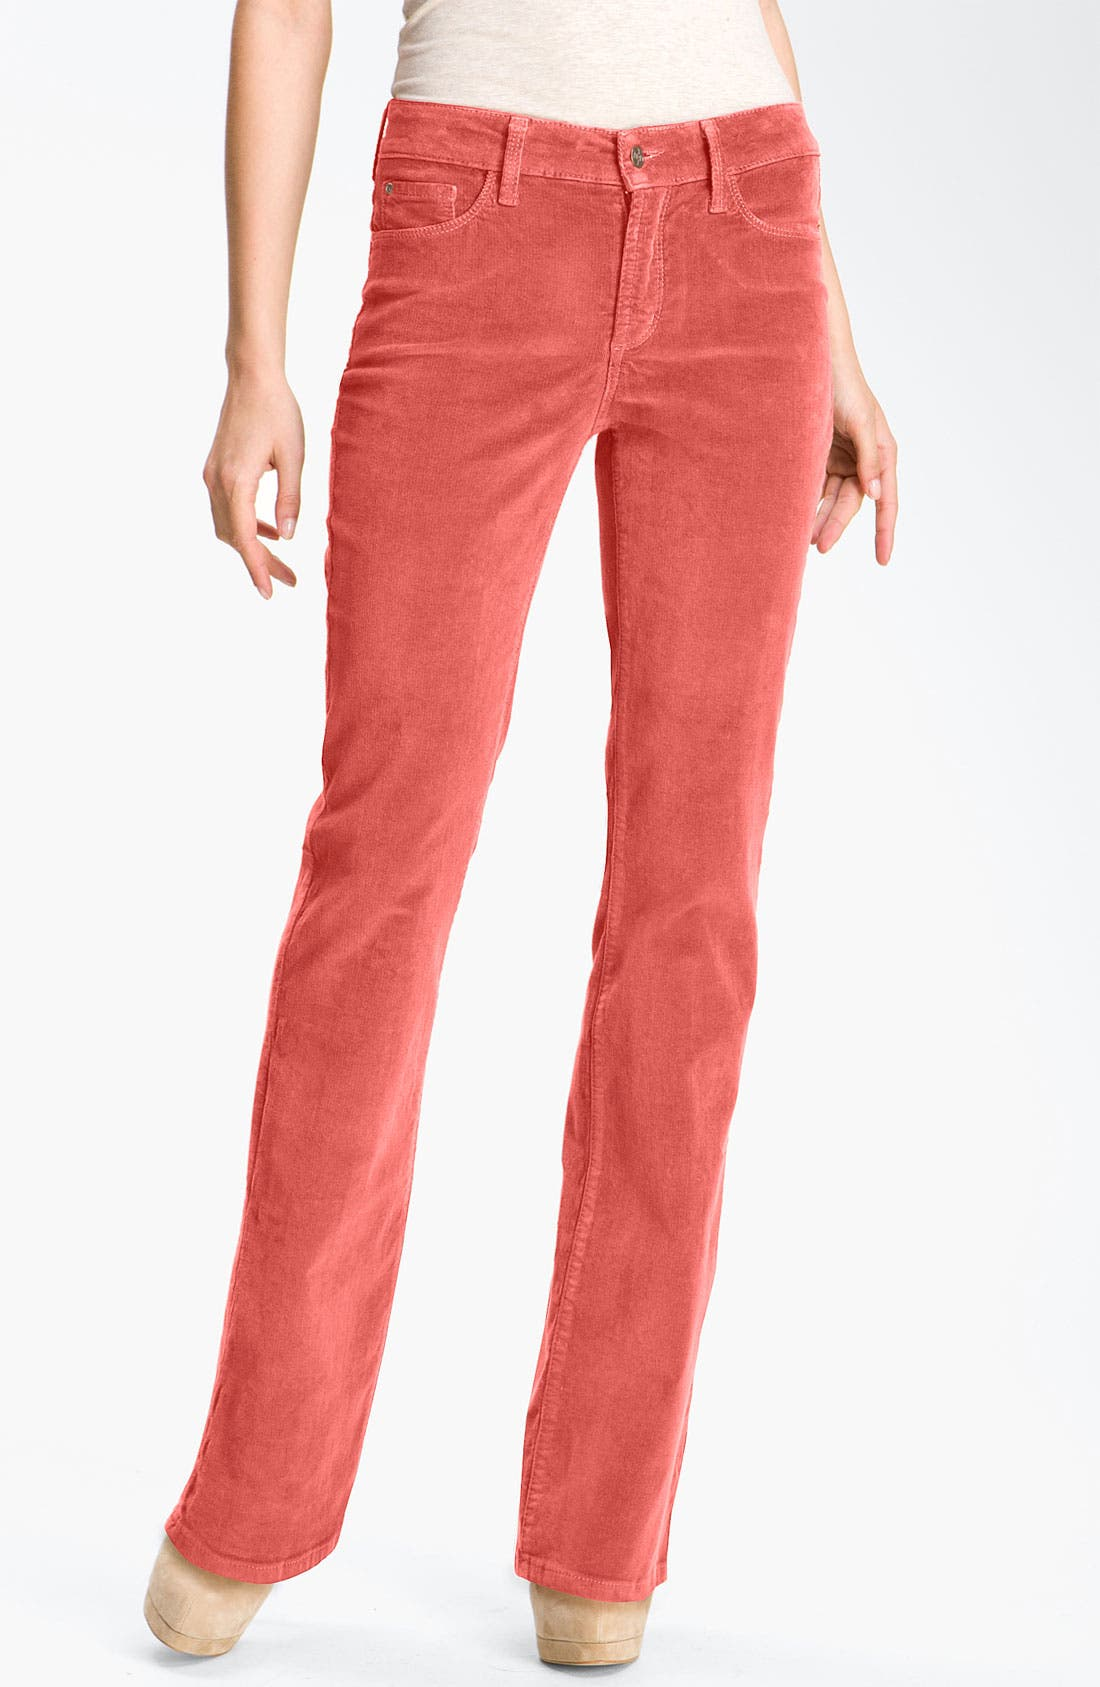 Main Image - NYDJ Bootcut Corduroy Jeans (Petite)